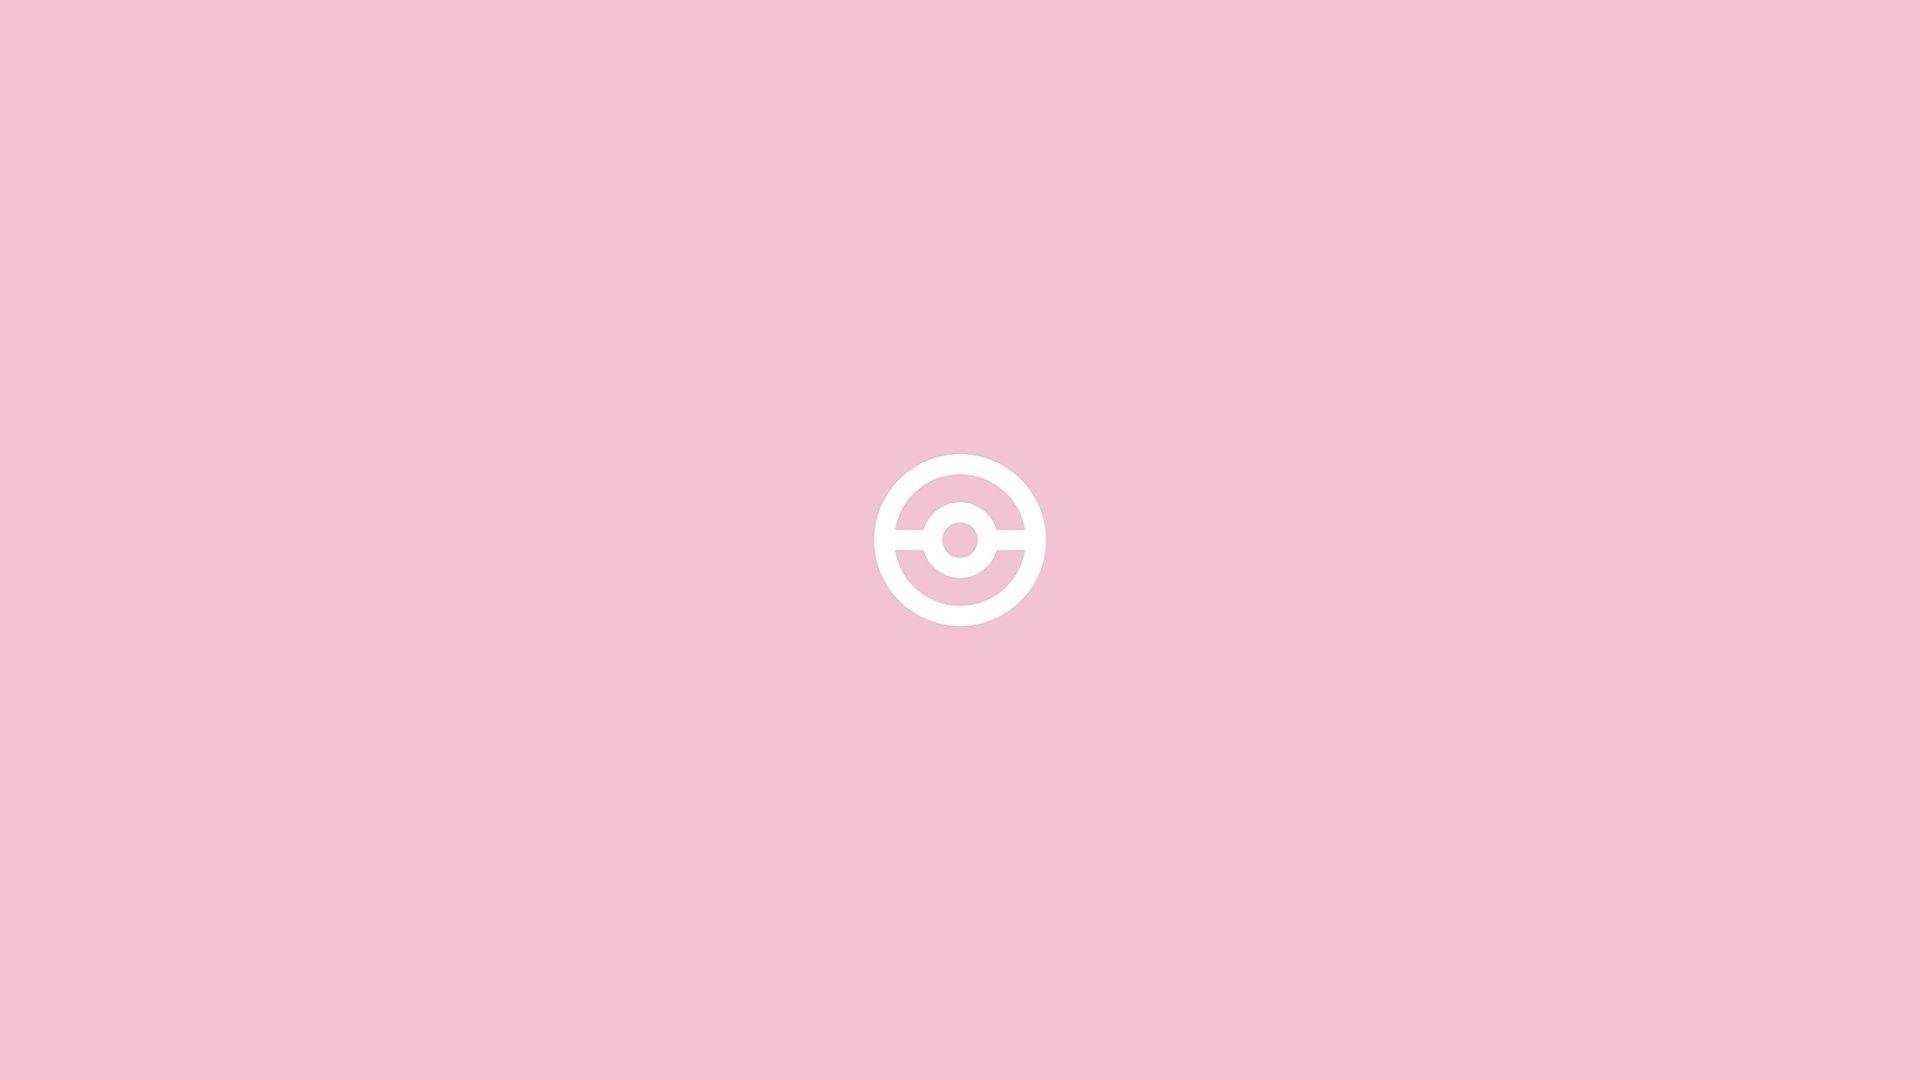 Cute Simple hd desktop wallpaper